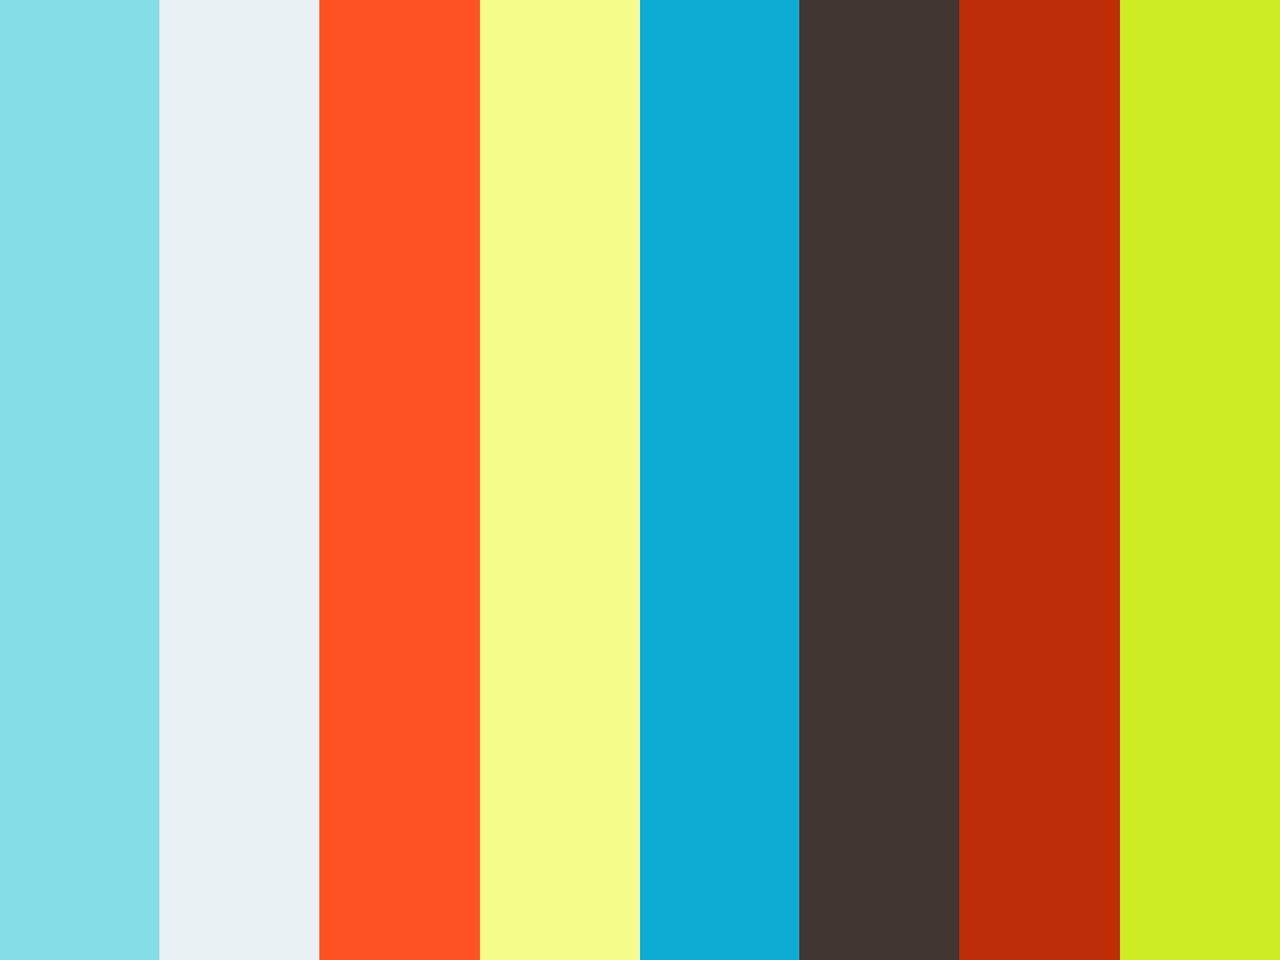 Codebreakers Kim: Klantteveredenheidsonderzoek